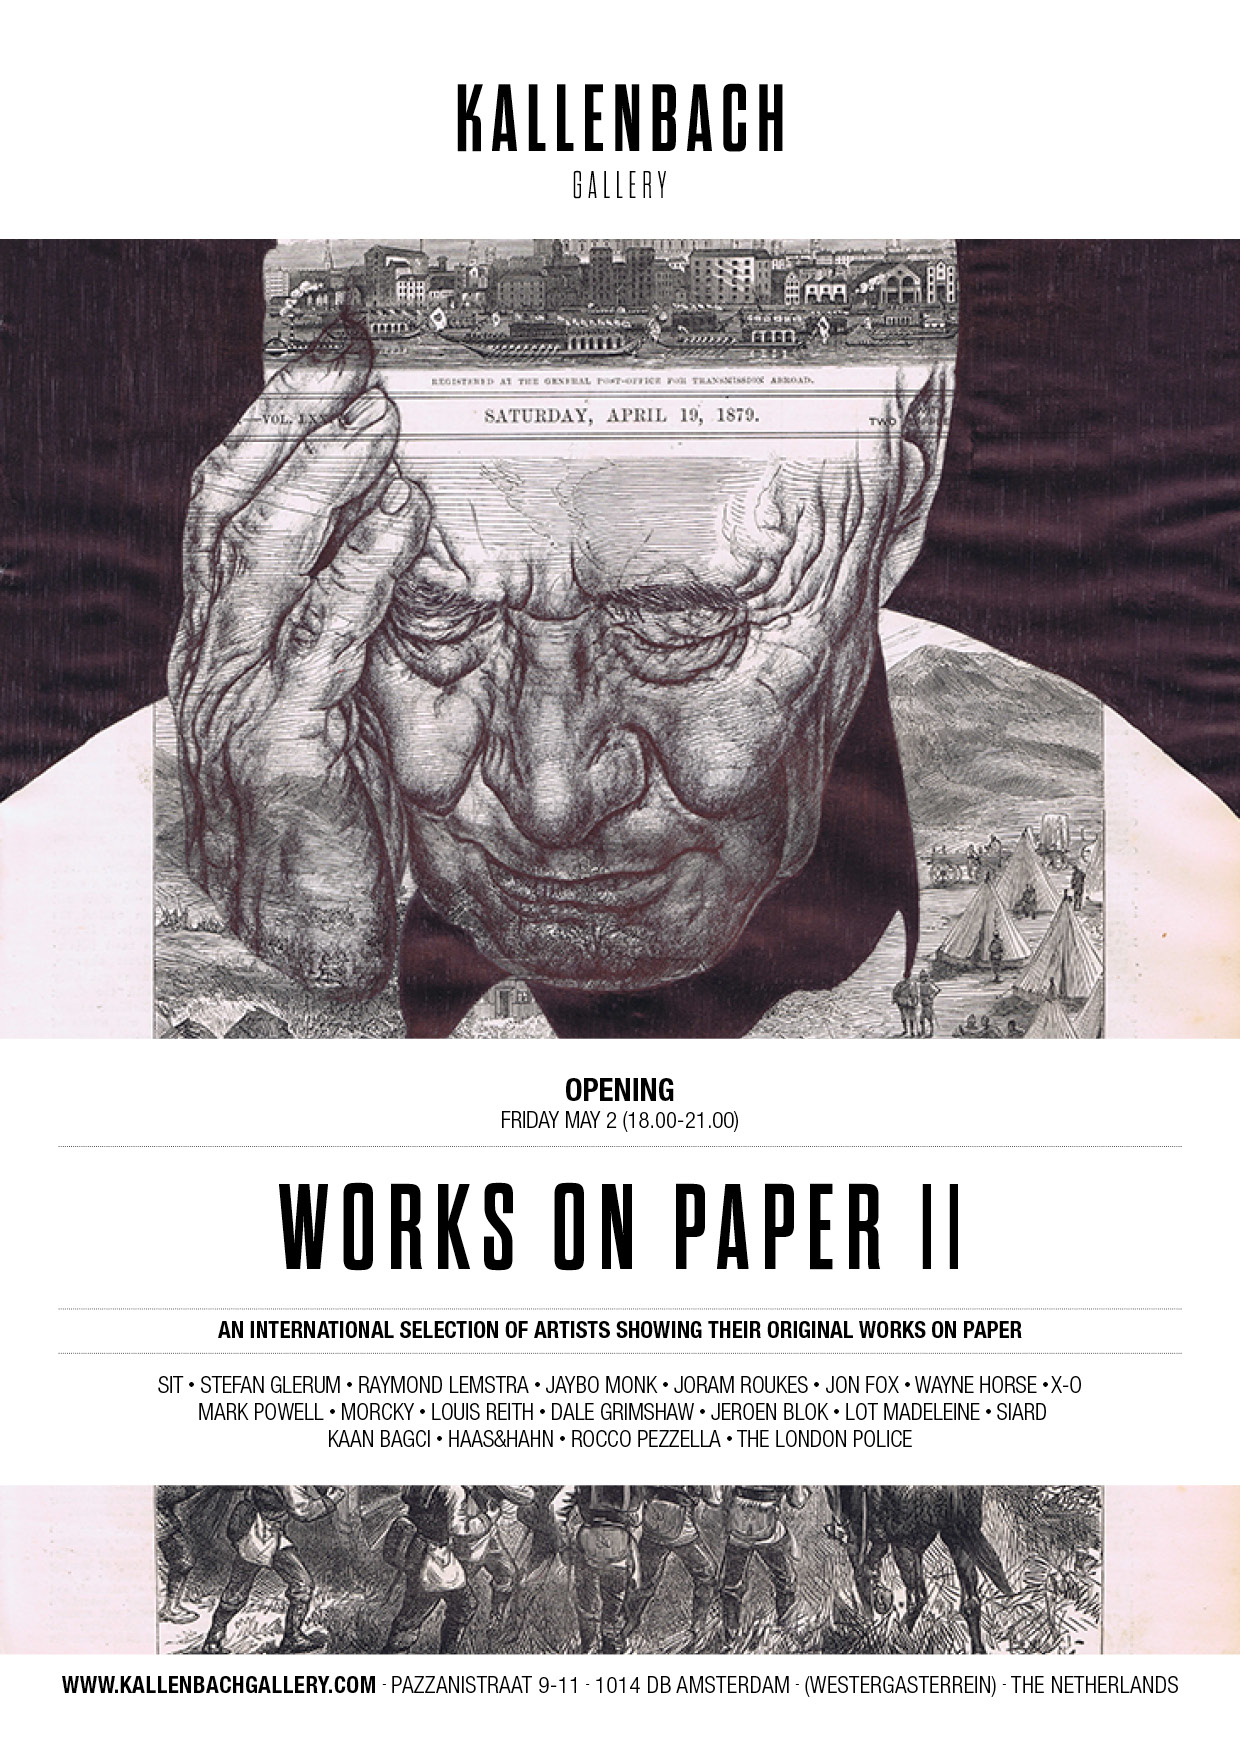 kallenbach_worksonpaper2014.jpg